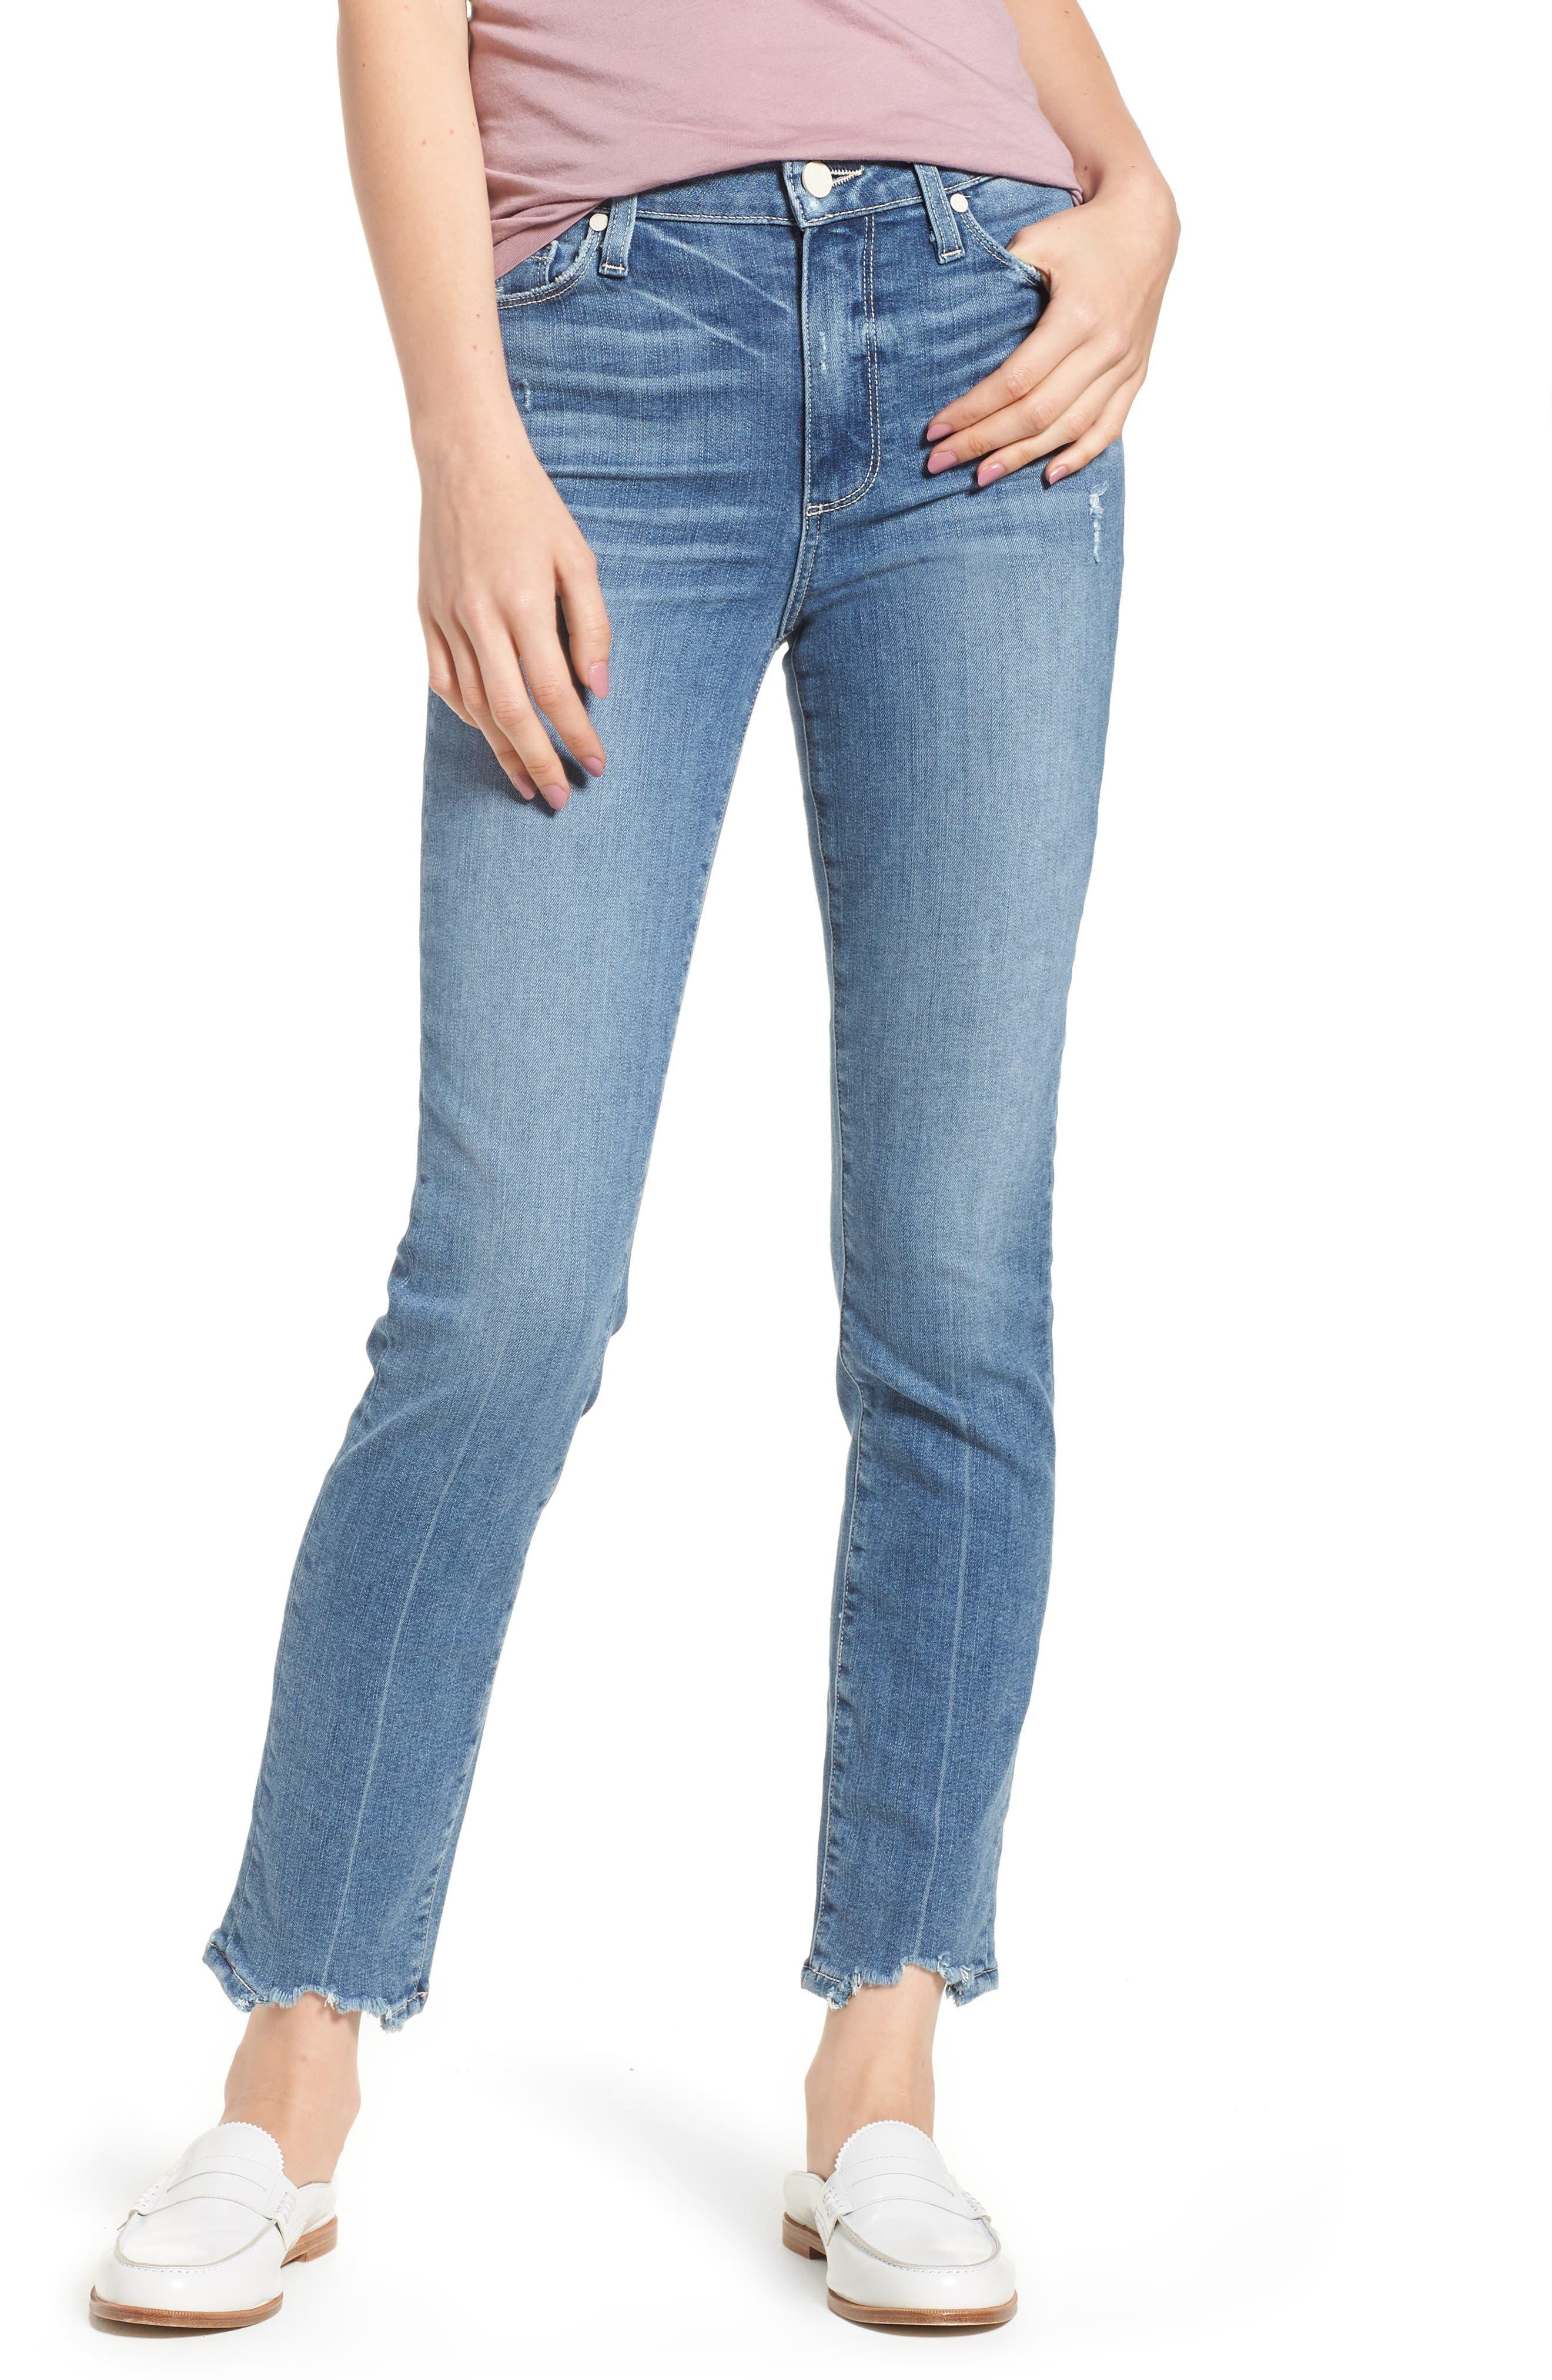 Transcend Vintage - Hoxton High Waist Ankle Skinny Jeans,                         Main,                         color, Zahara